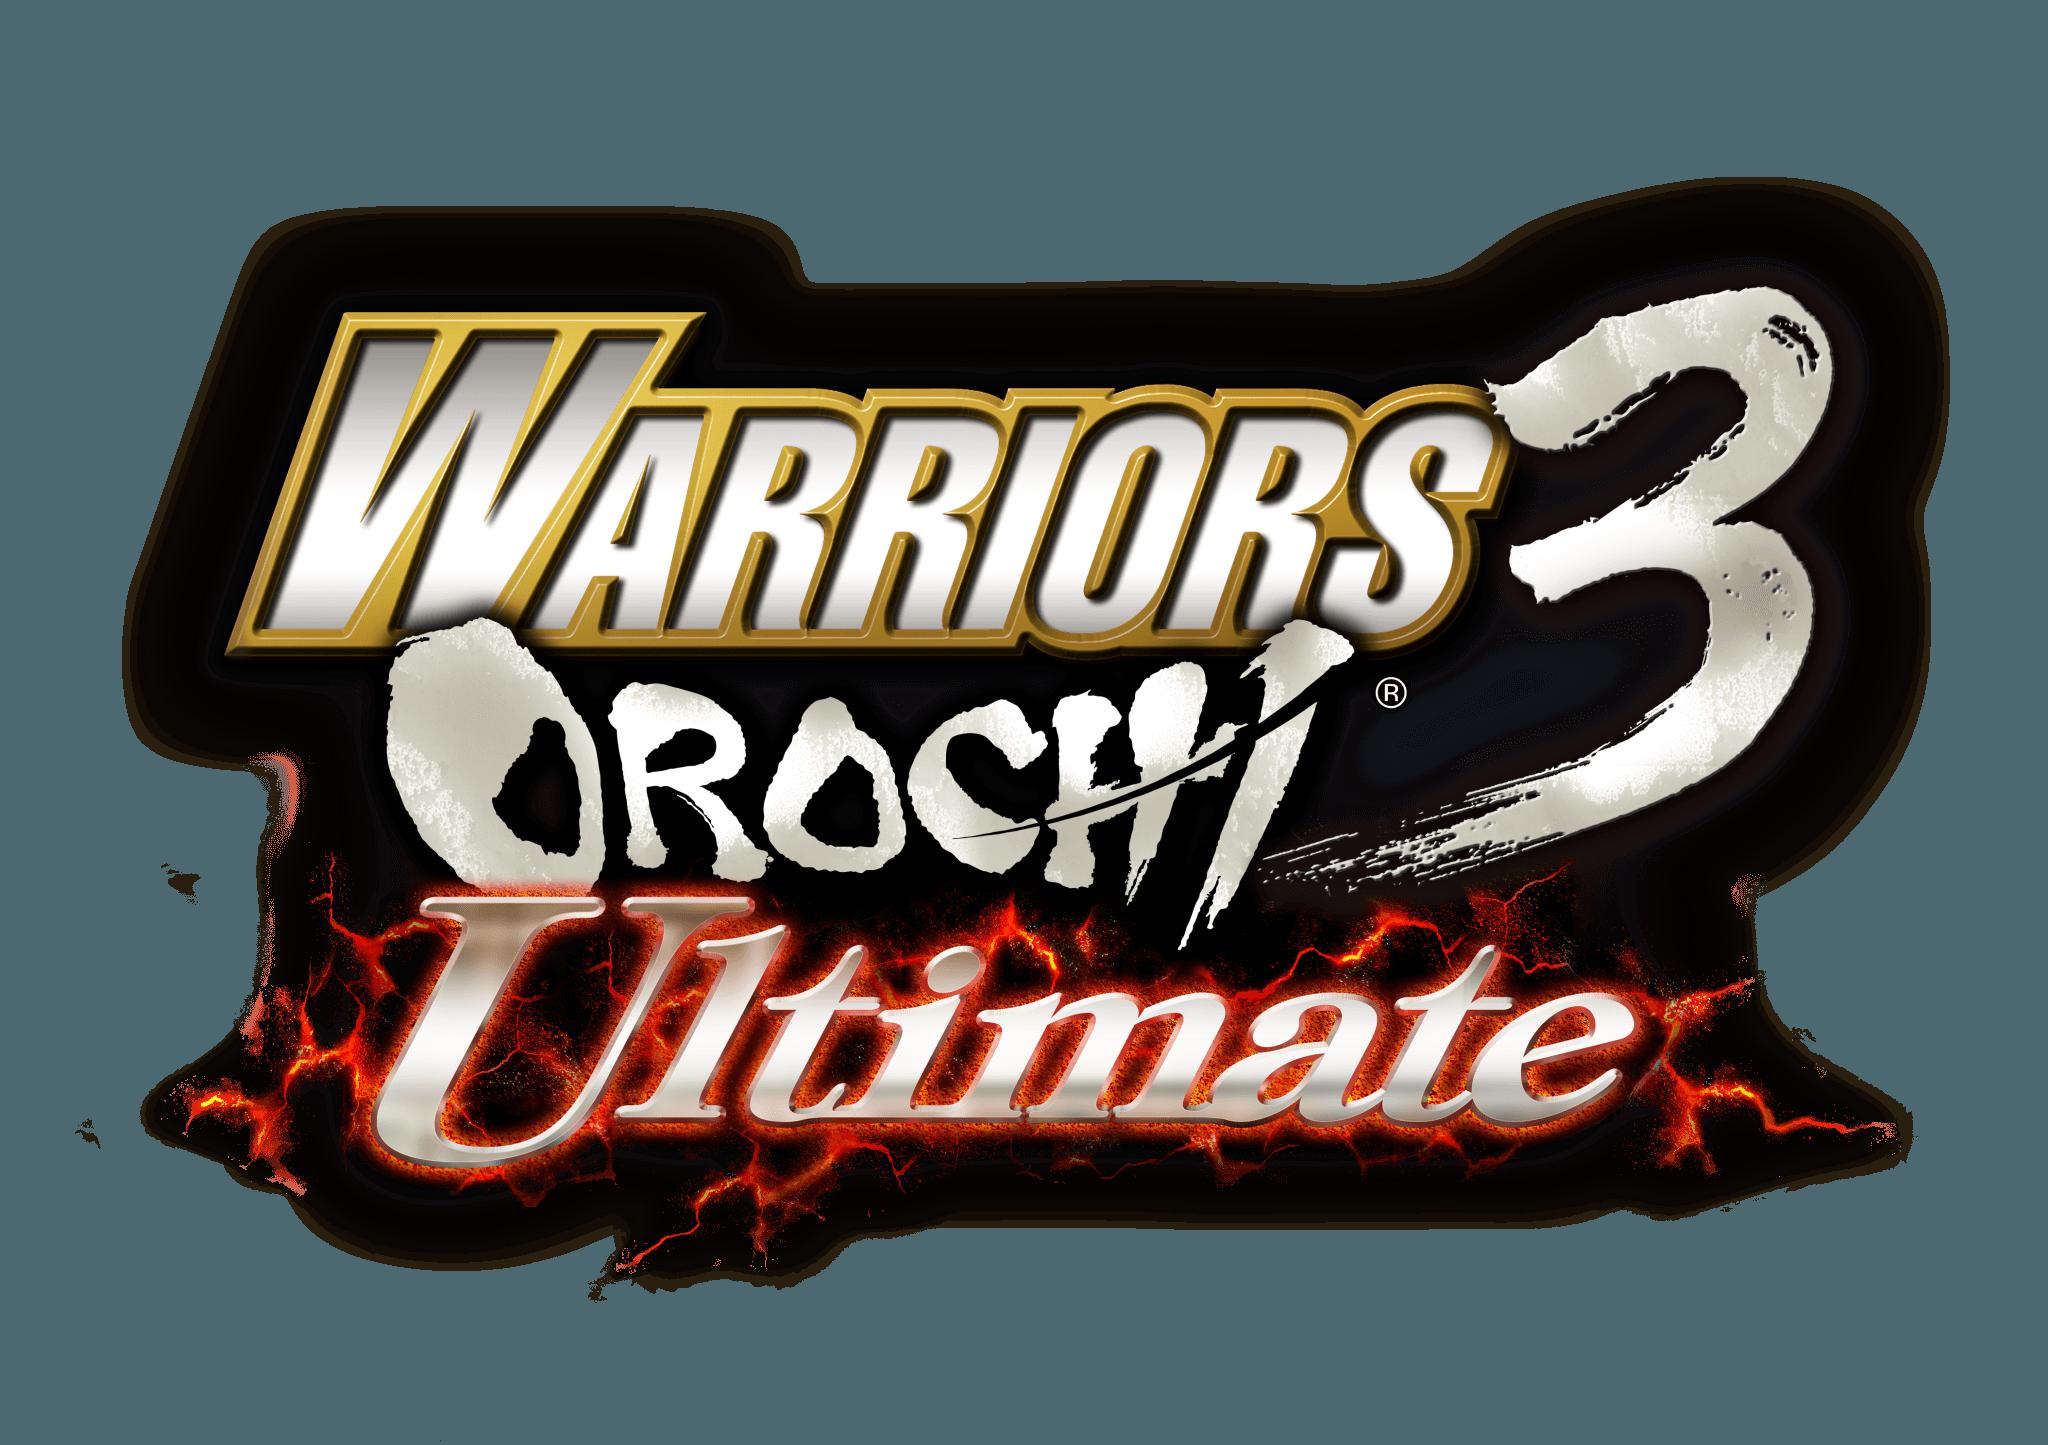 warriors-orochi-3-ultimate-title